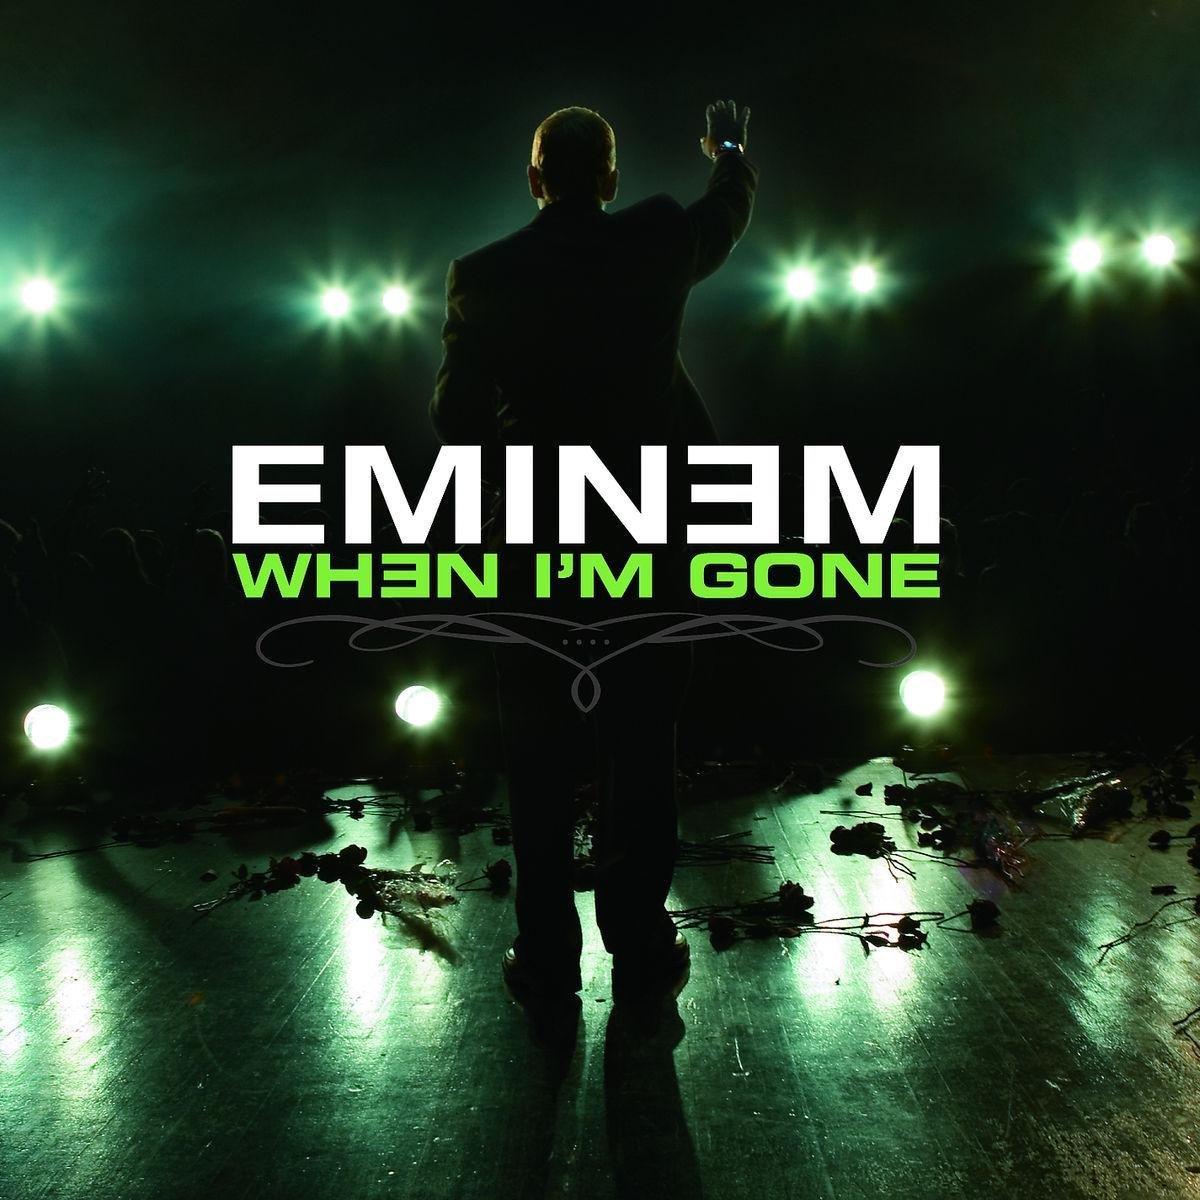 Eminem When I'm Gone